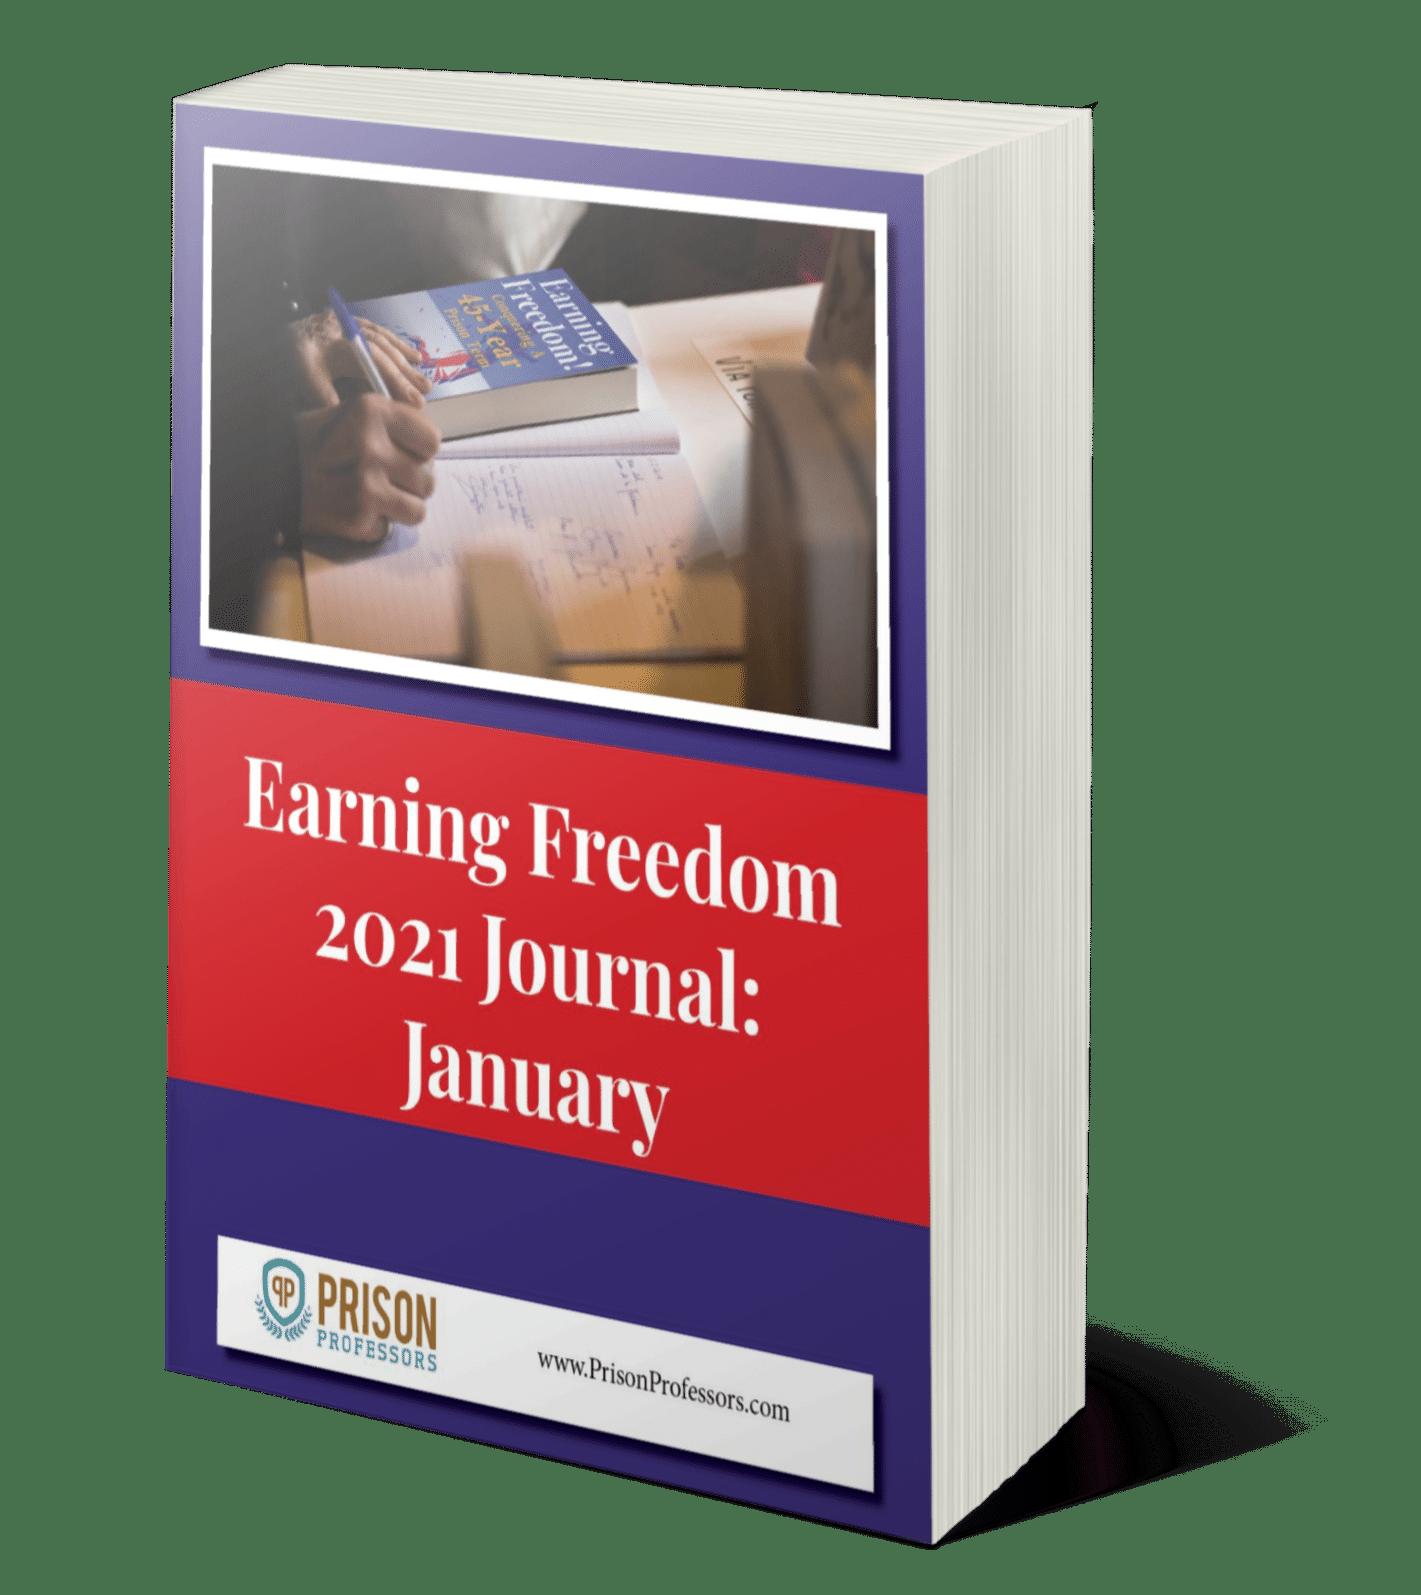 Earning Freedom 2021 Journal